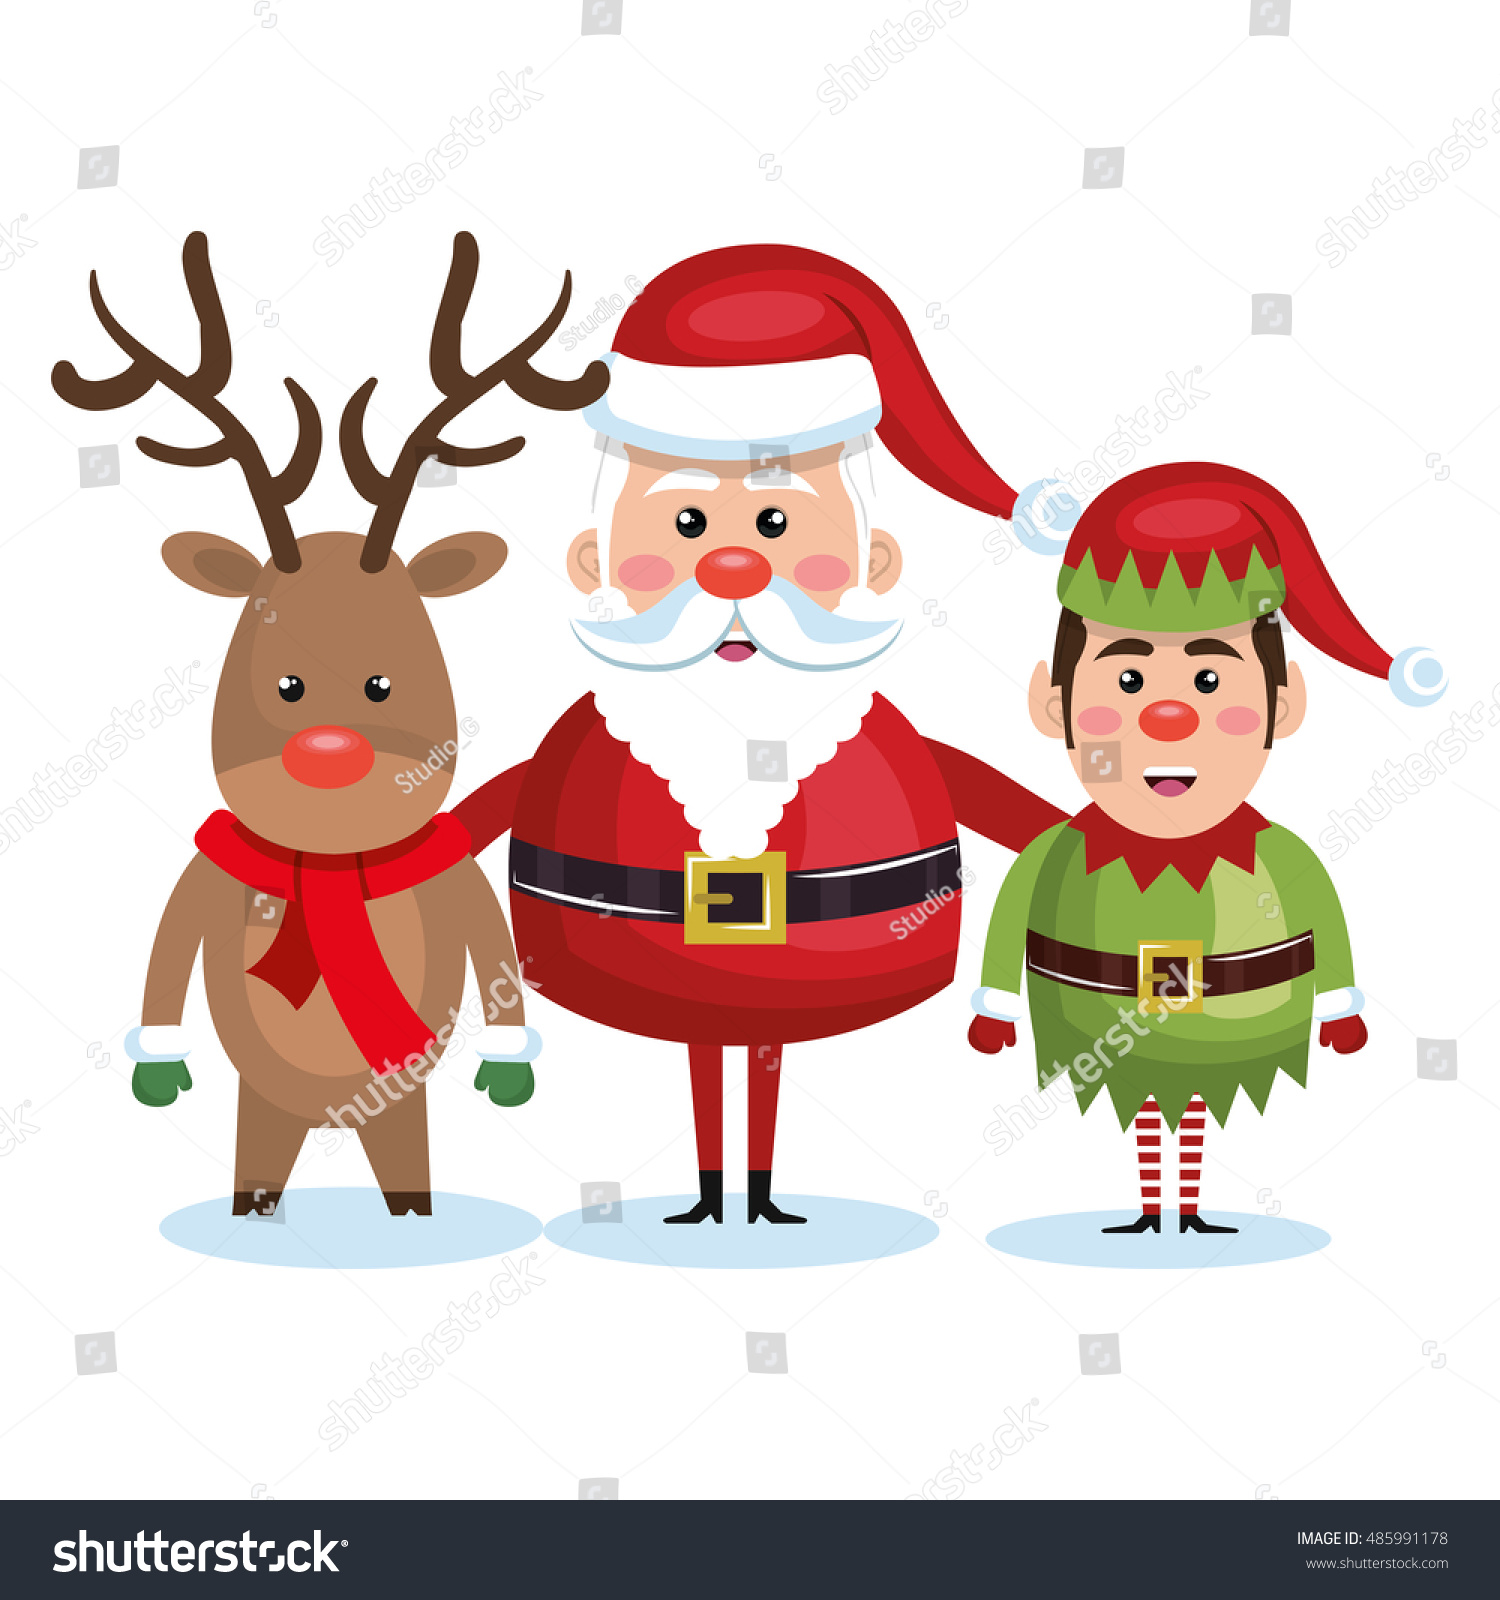 santa claus reindeer and elf christmas stock vector